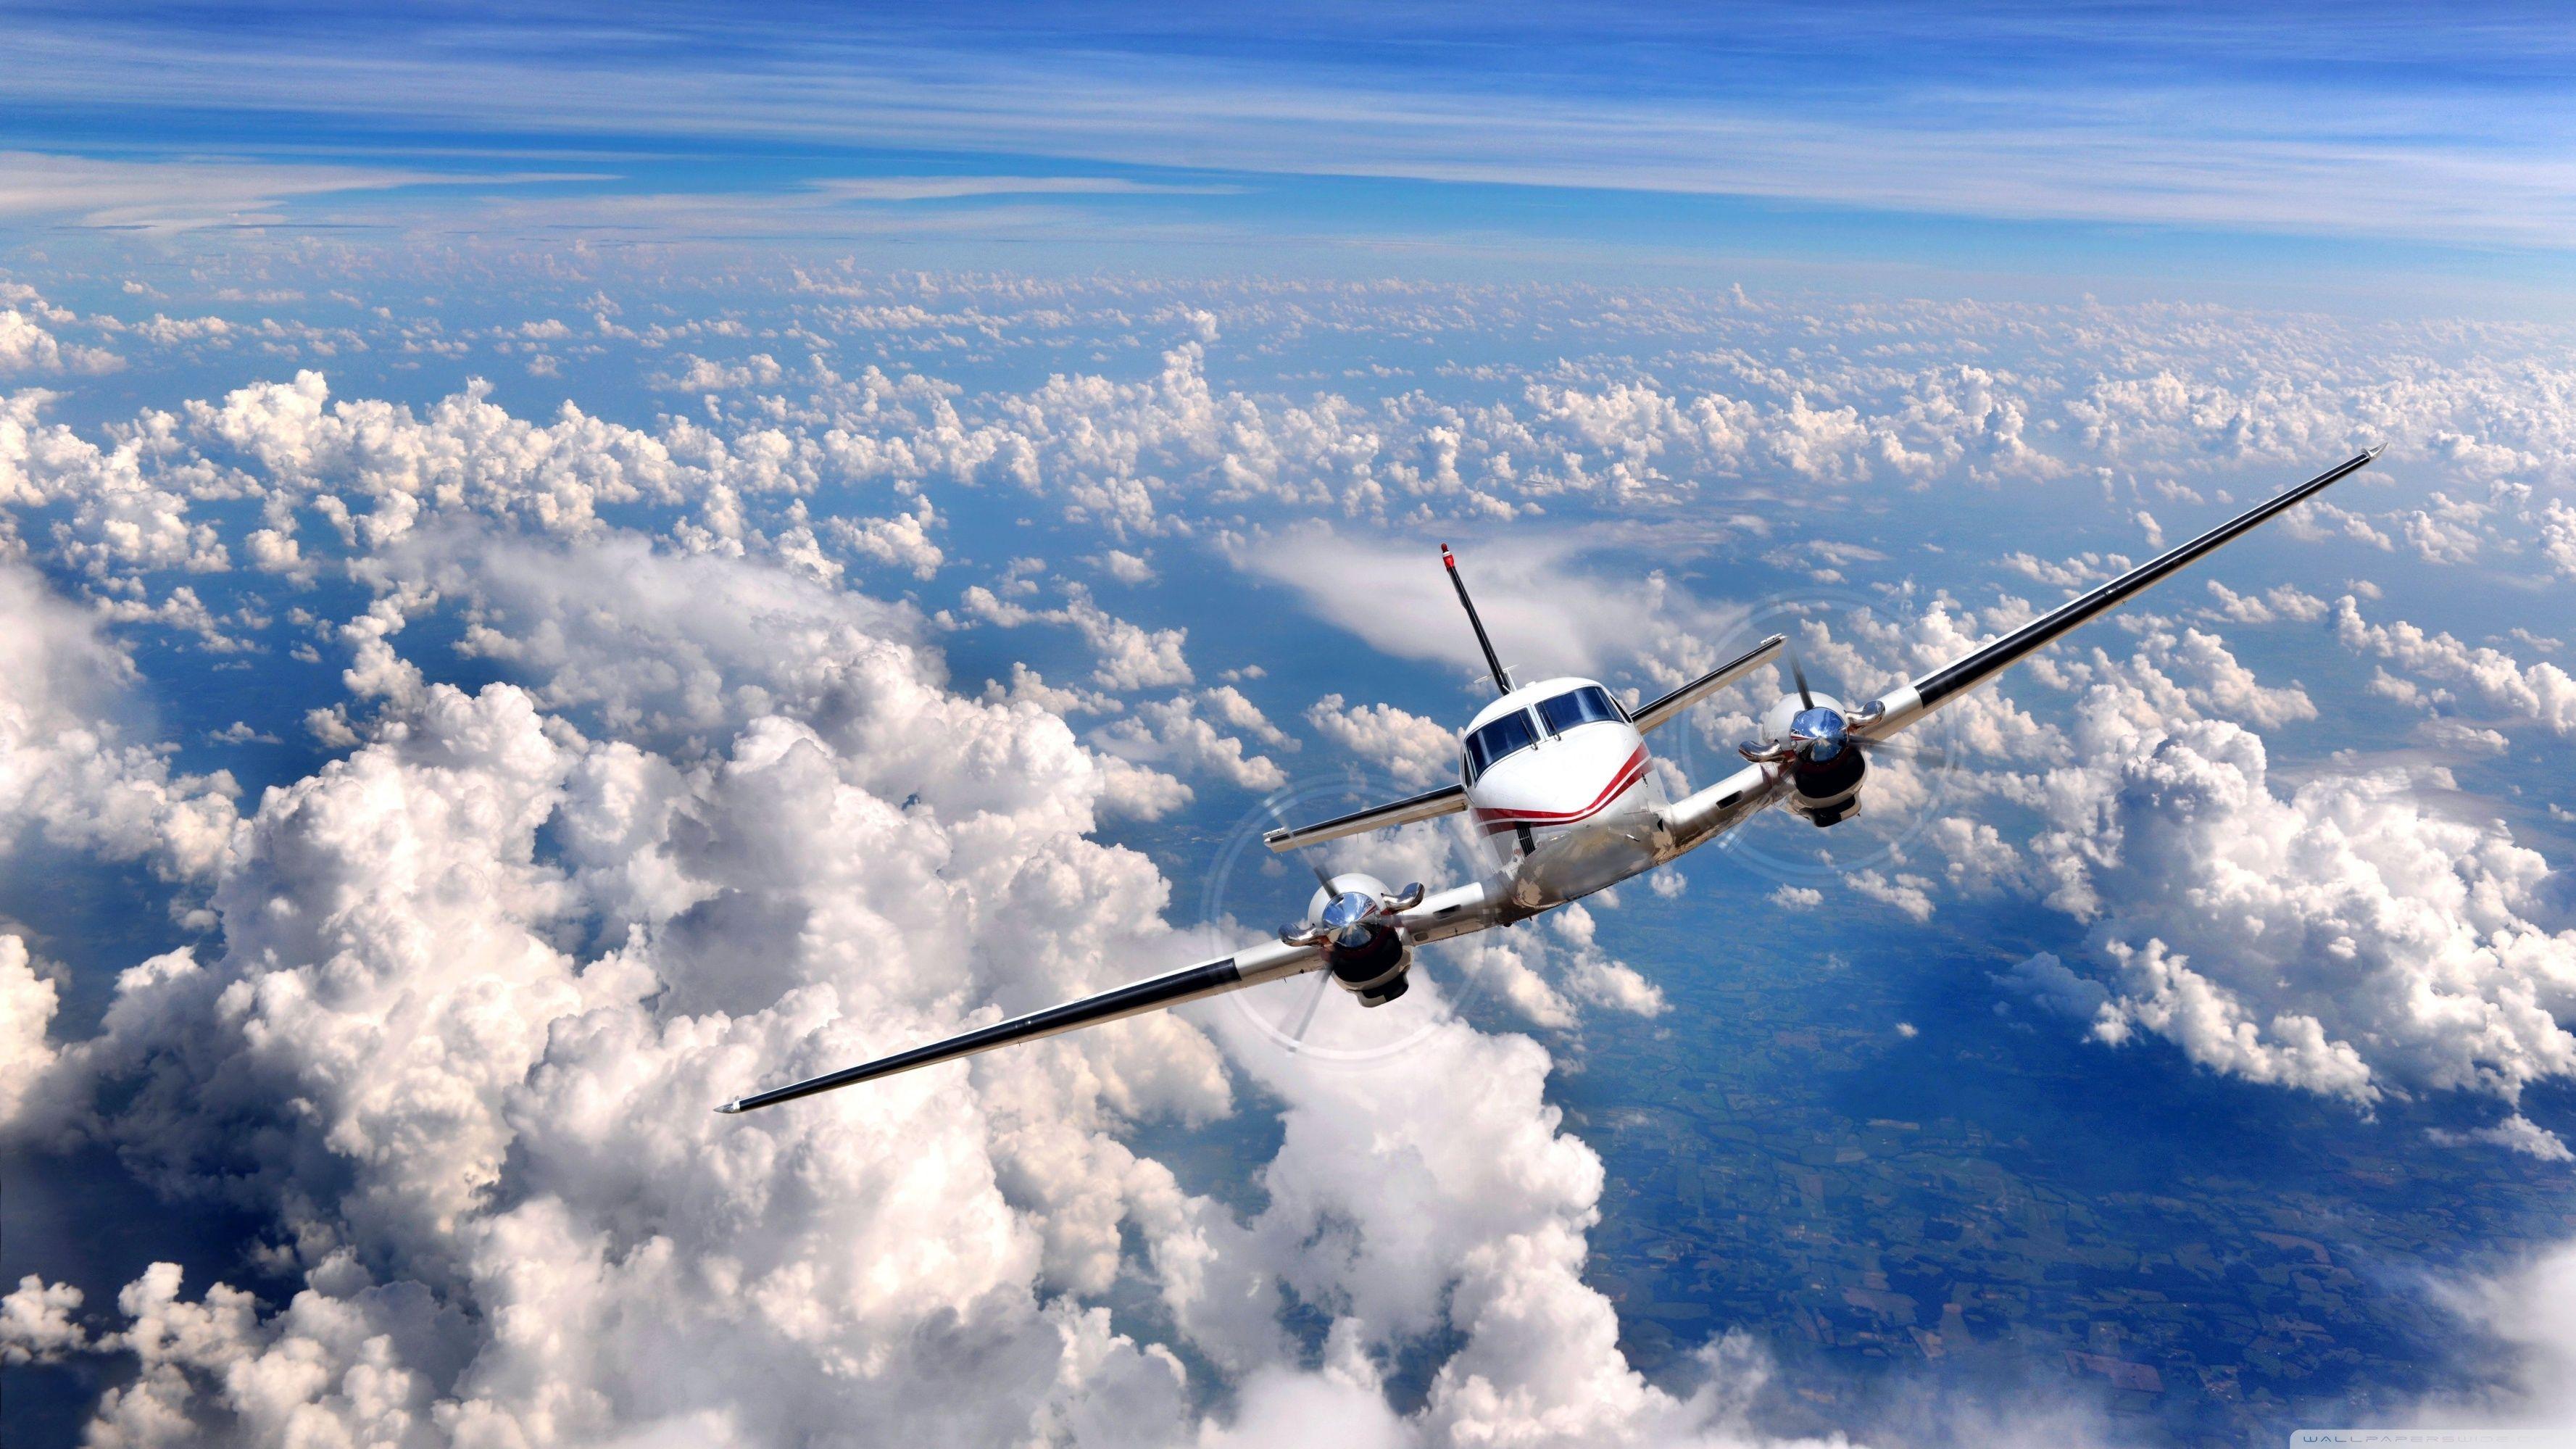 microsoft flight simulator background wallpaper 72747